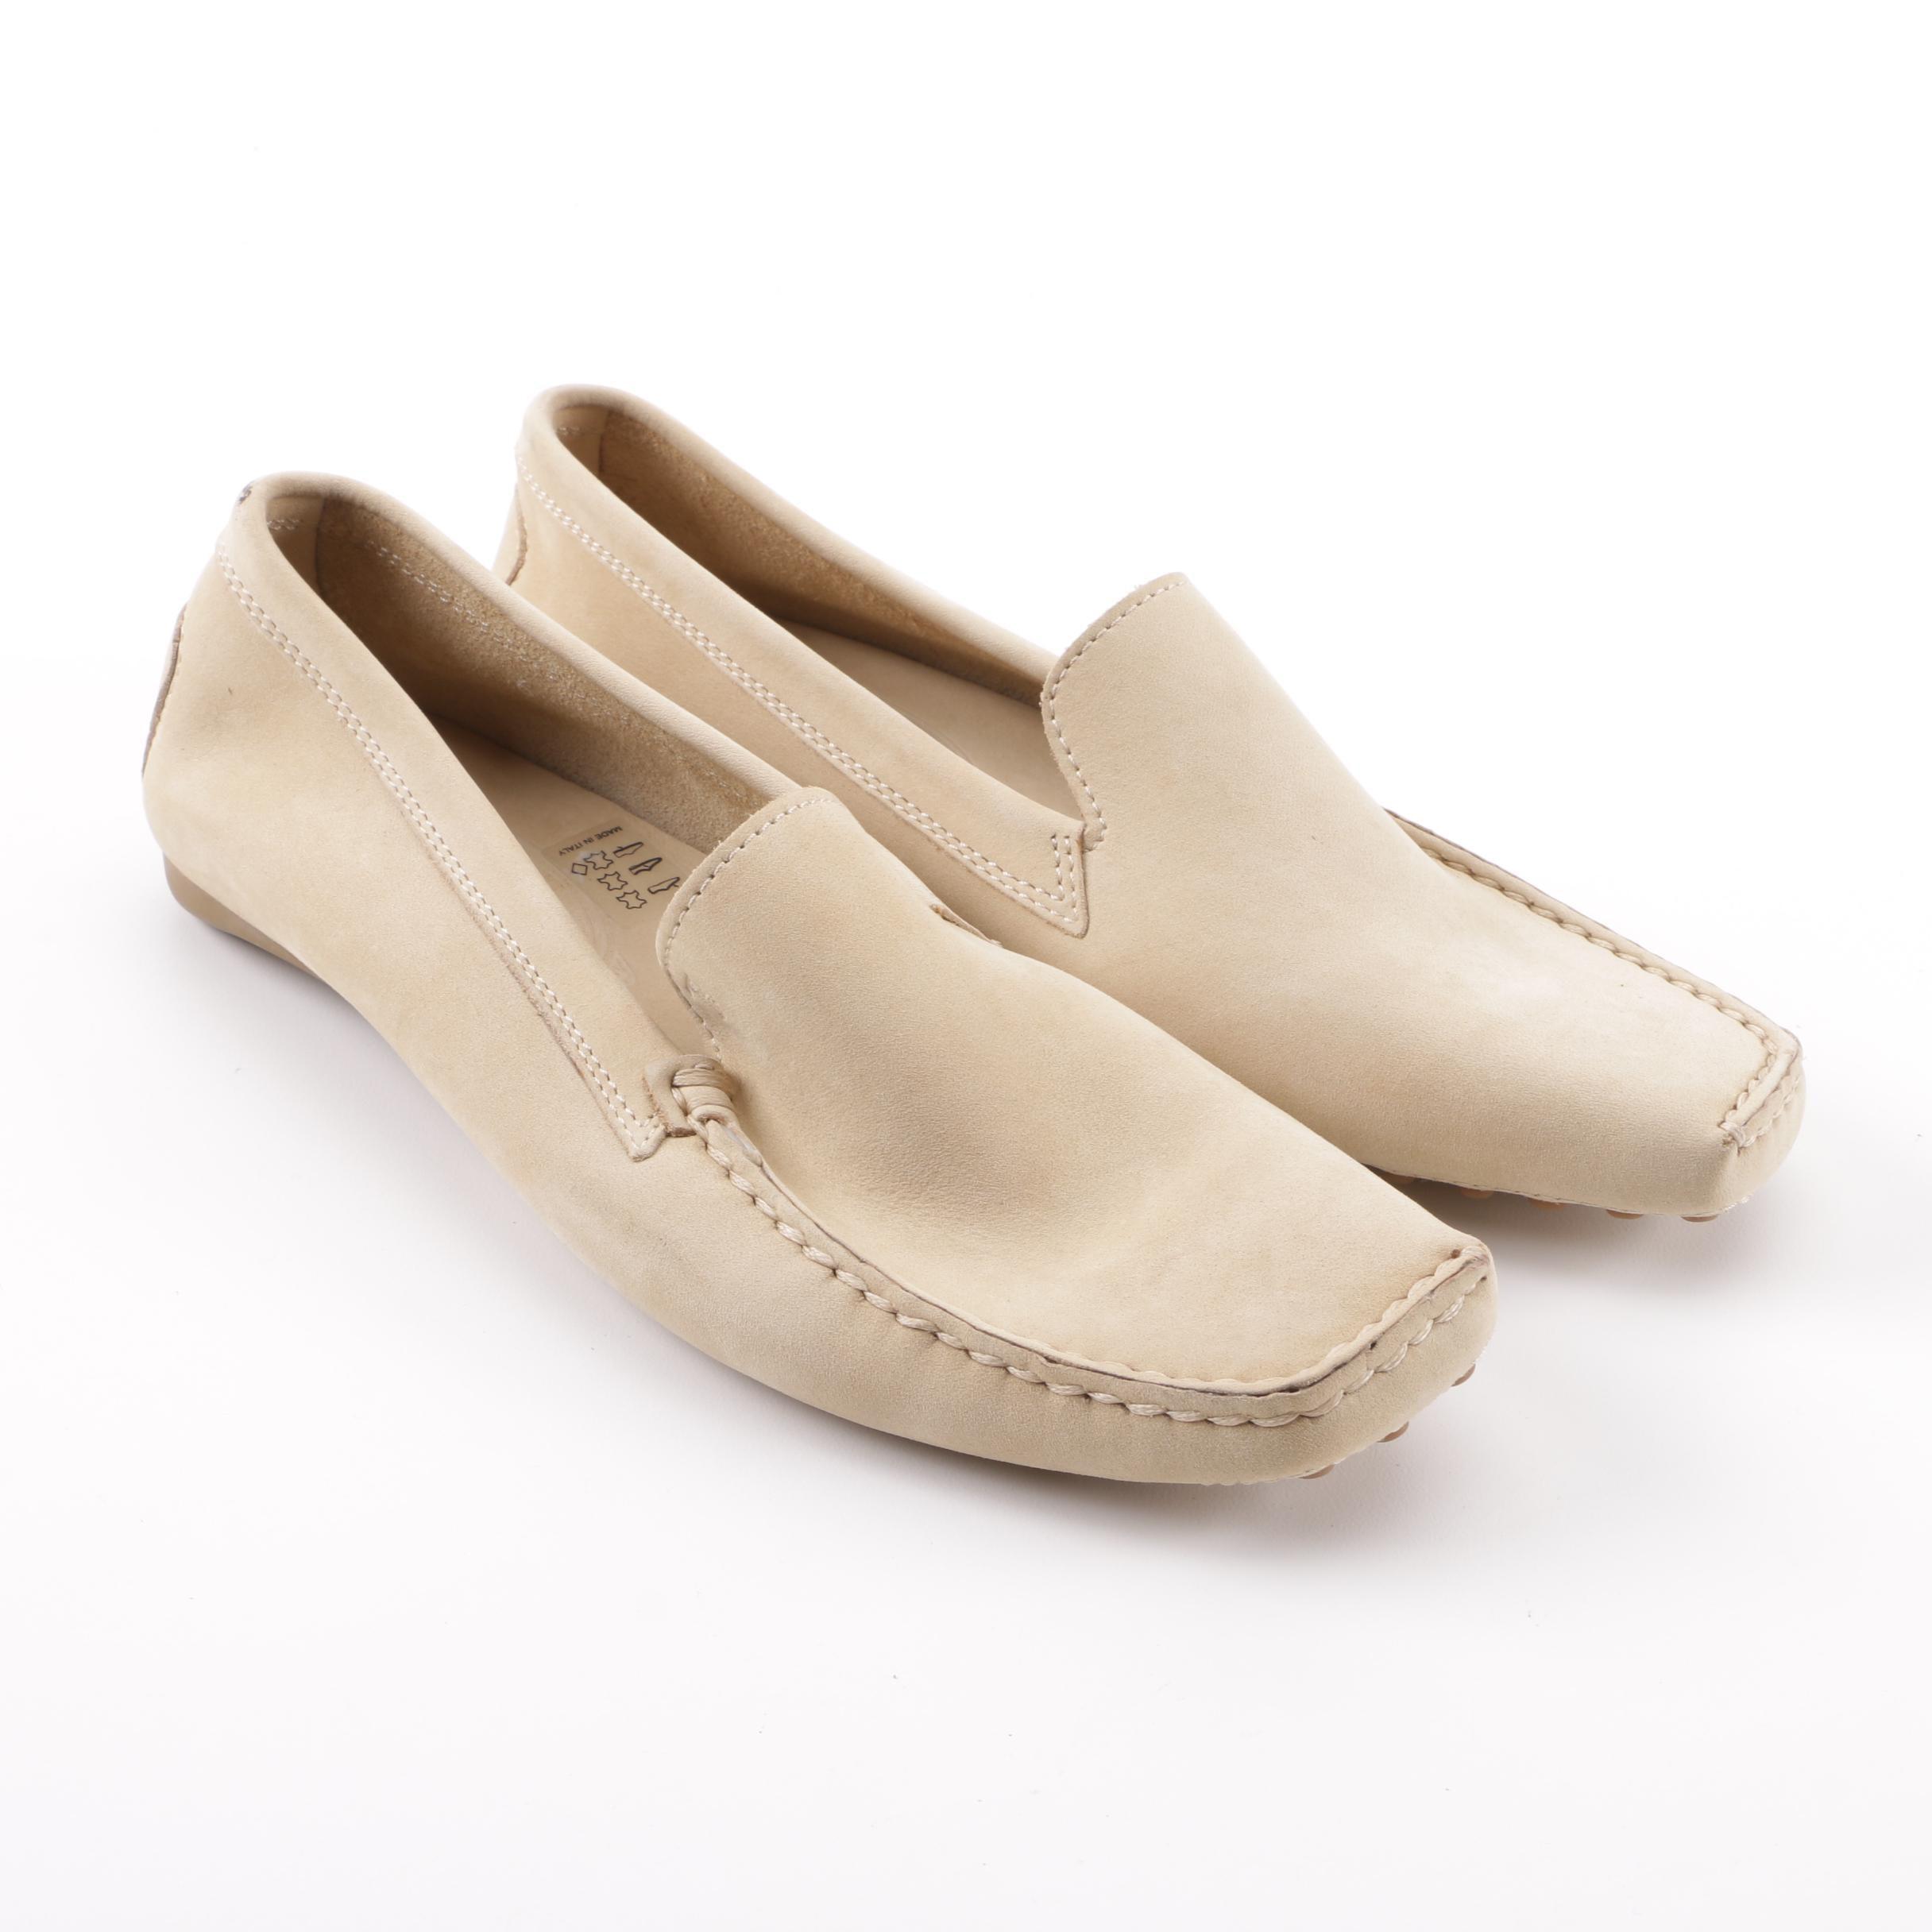 Women's Tod's Beige Suede Loafers